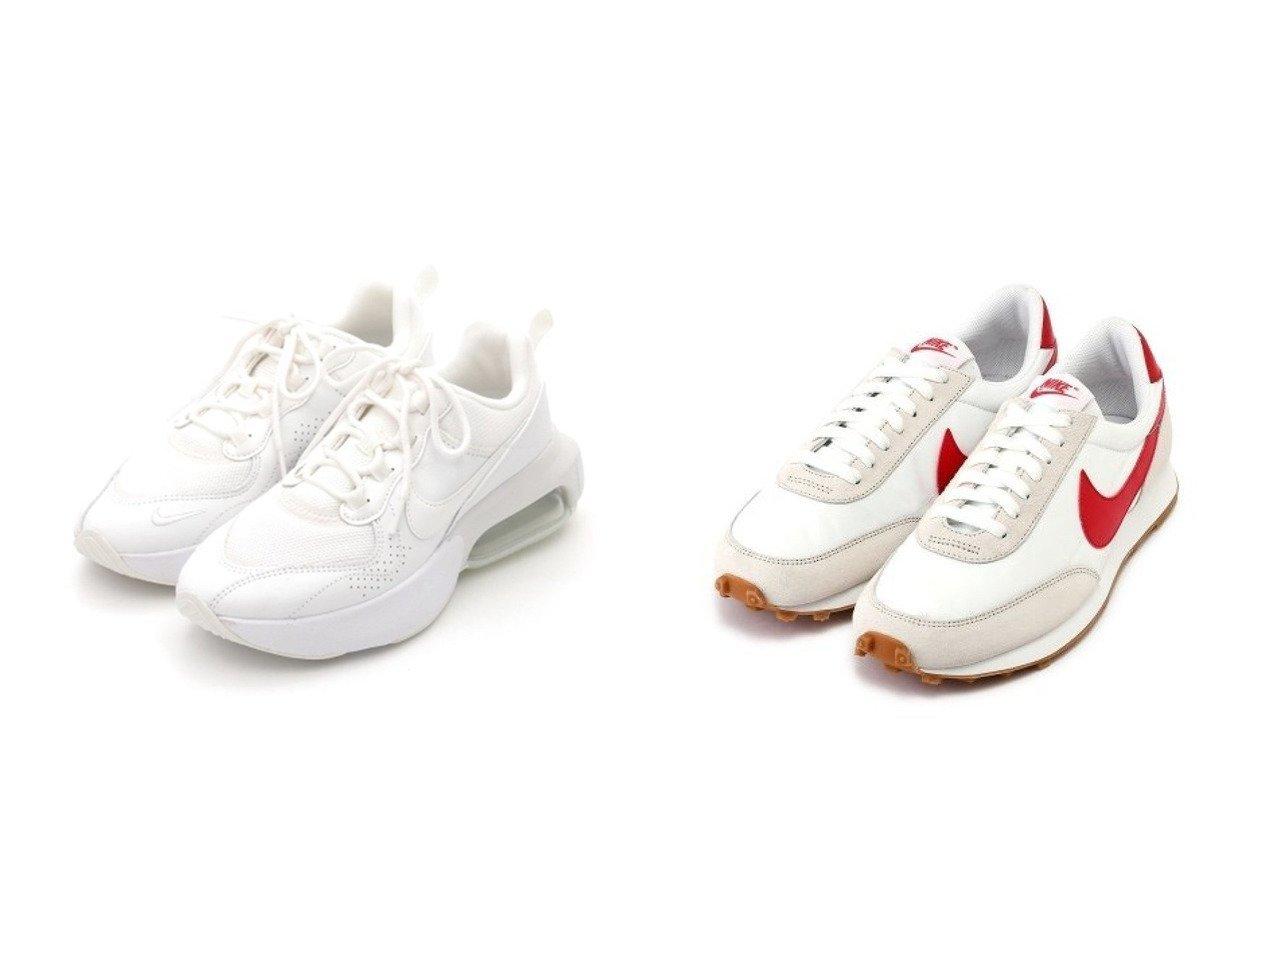 【emmi/エミ】の【NIKE meets emmi】W NIKE DAYBREAK&【NIKE】W AIR MAX VERONA シューズ・靴のおすすめ!人気、トレンド・レディースファッションの通販  おすすめで人気の流行・トレンド、ファッションの通販商品 メンズファッション・キッズファッション・インテリア・家具・レディースファッション・服の通販 founy(ファニー) https://founy.com/ ファッション Fashion レディースファッション WOMEN シューズ スニーカー スリッポン スタイリッシュ 切替  ID:crp329100000009838